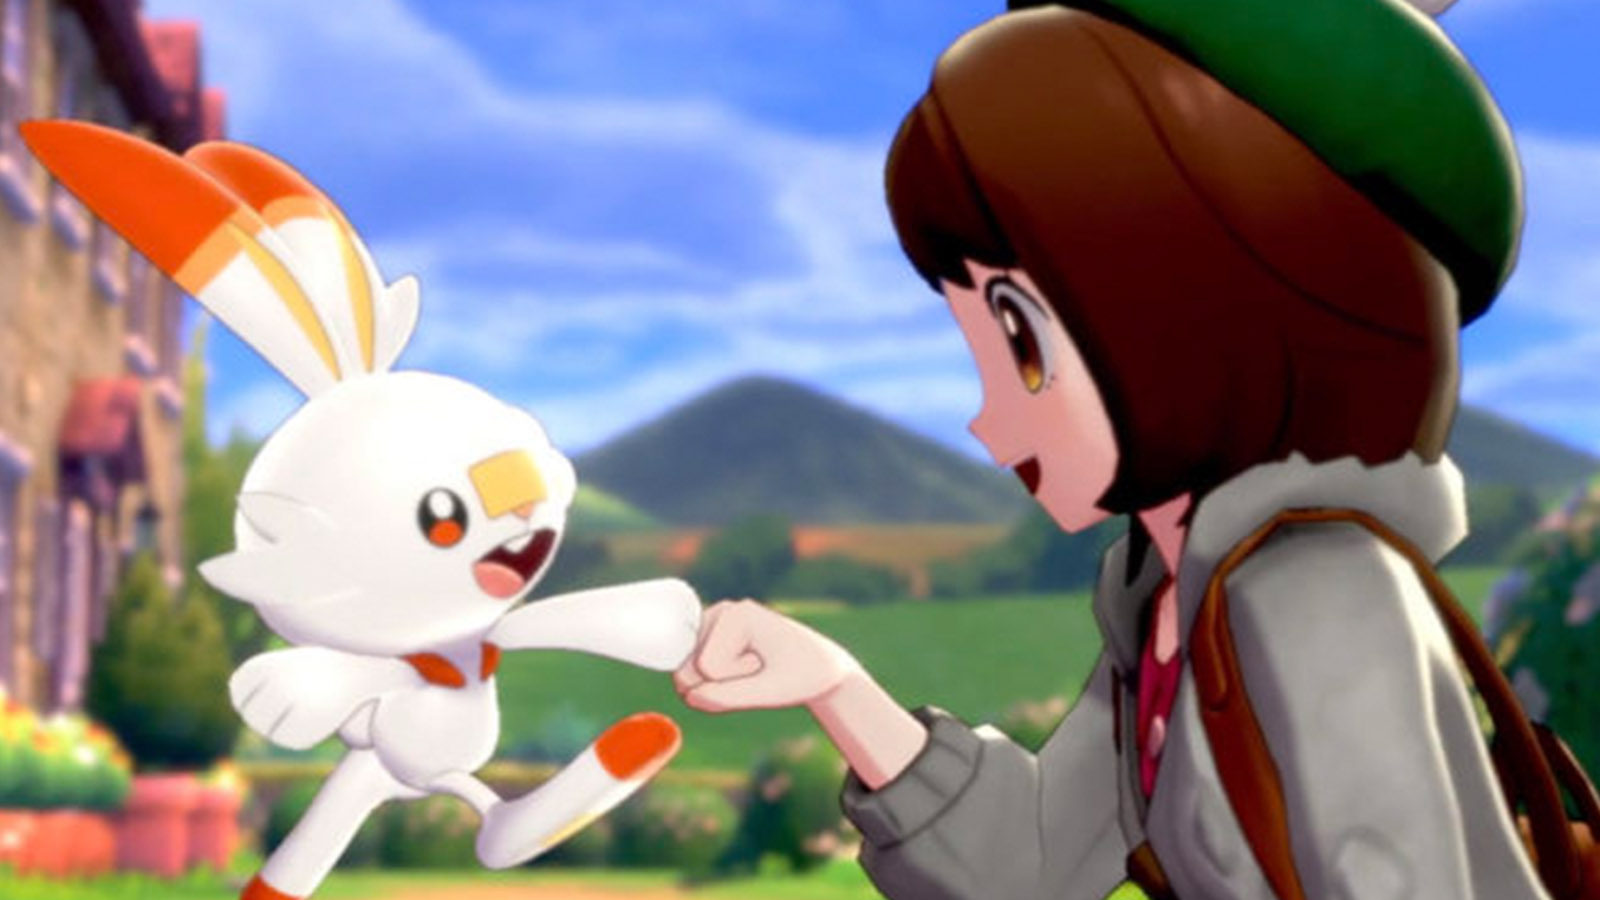 《Fami 通》采访确认《宝可梦 剑/盾》将不含 Mega 进化、Z 招式